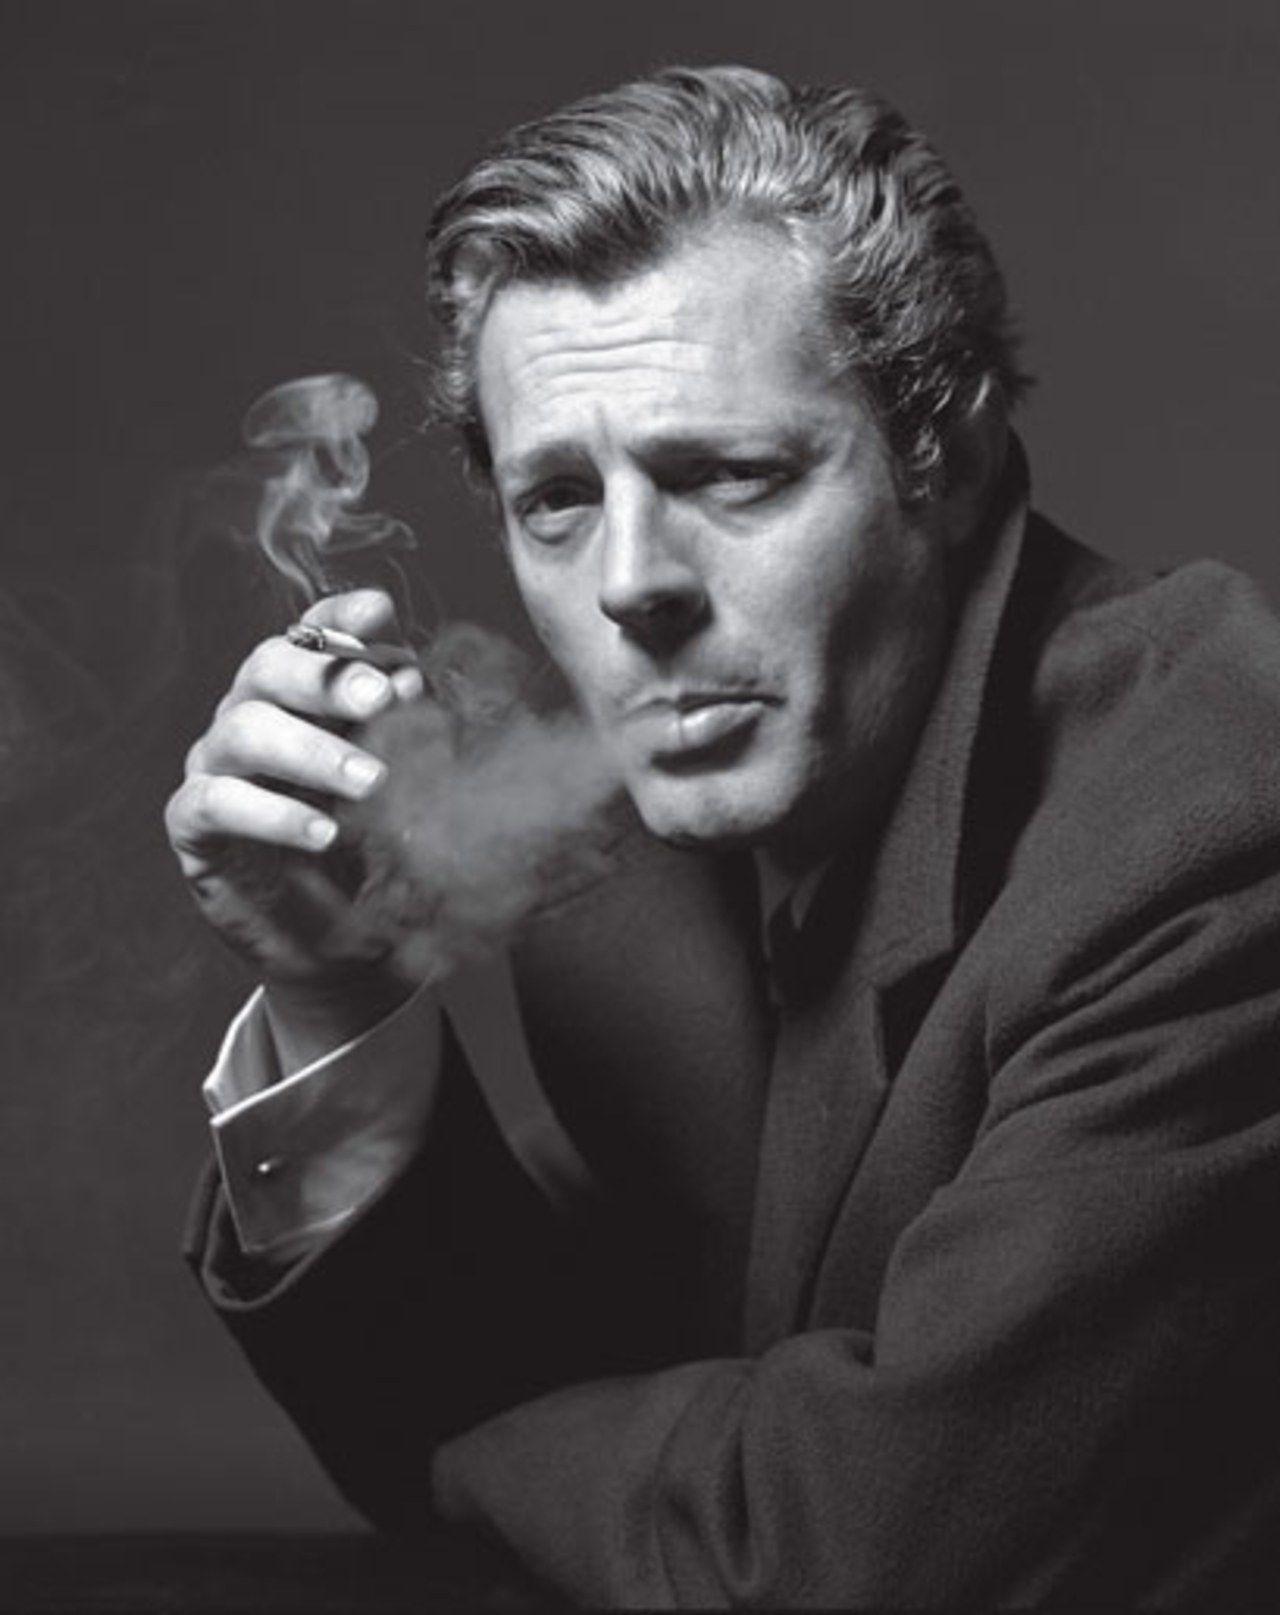 The 50 Most Stylish Leading Men of the Past Half Century